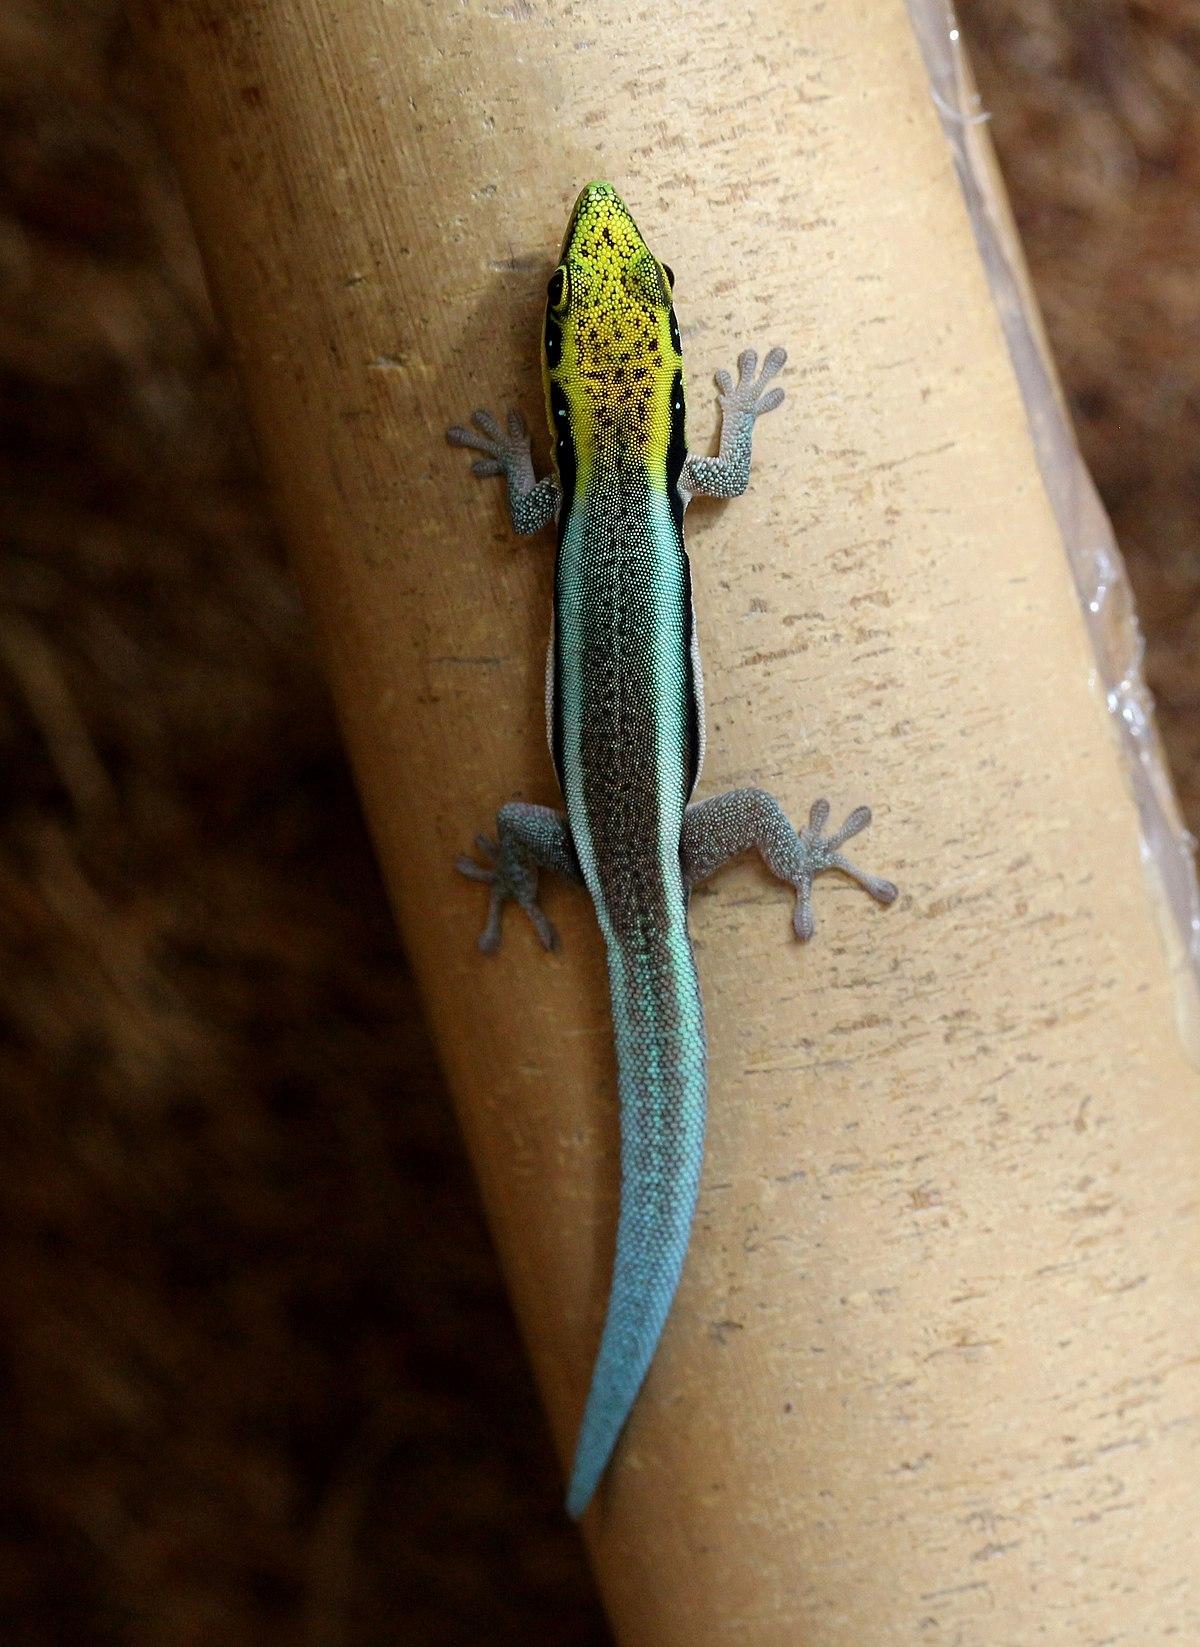 Blauer Bambus-Taggecko – Wikipedia